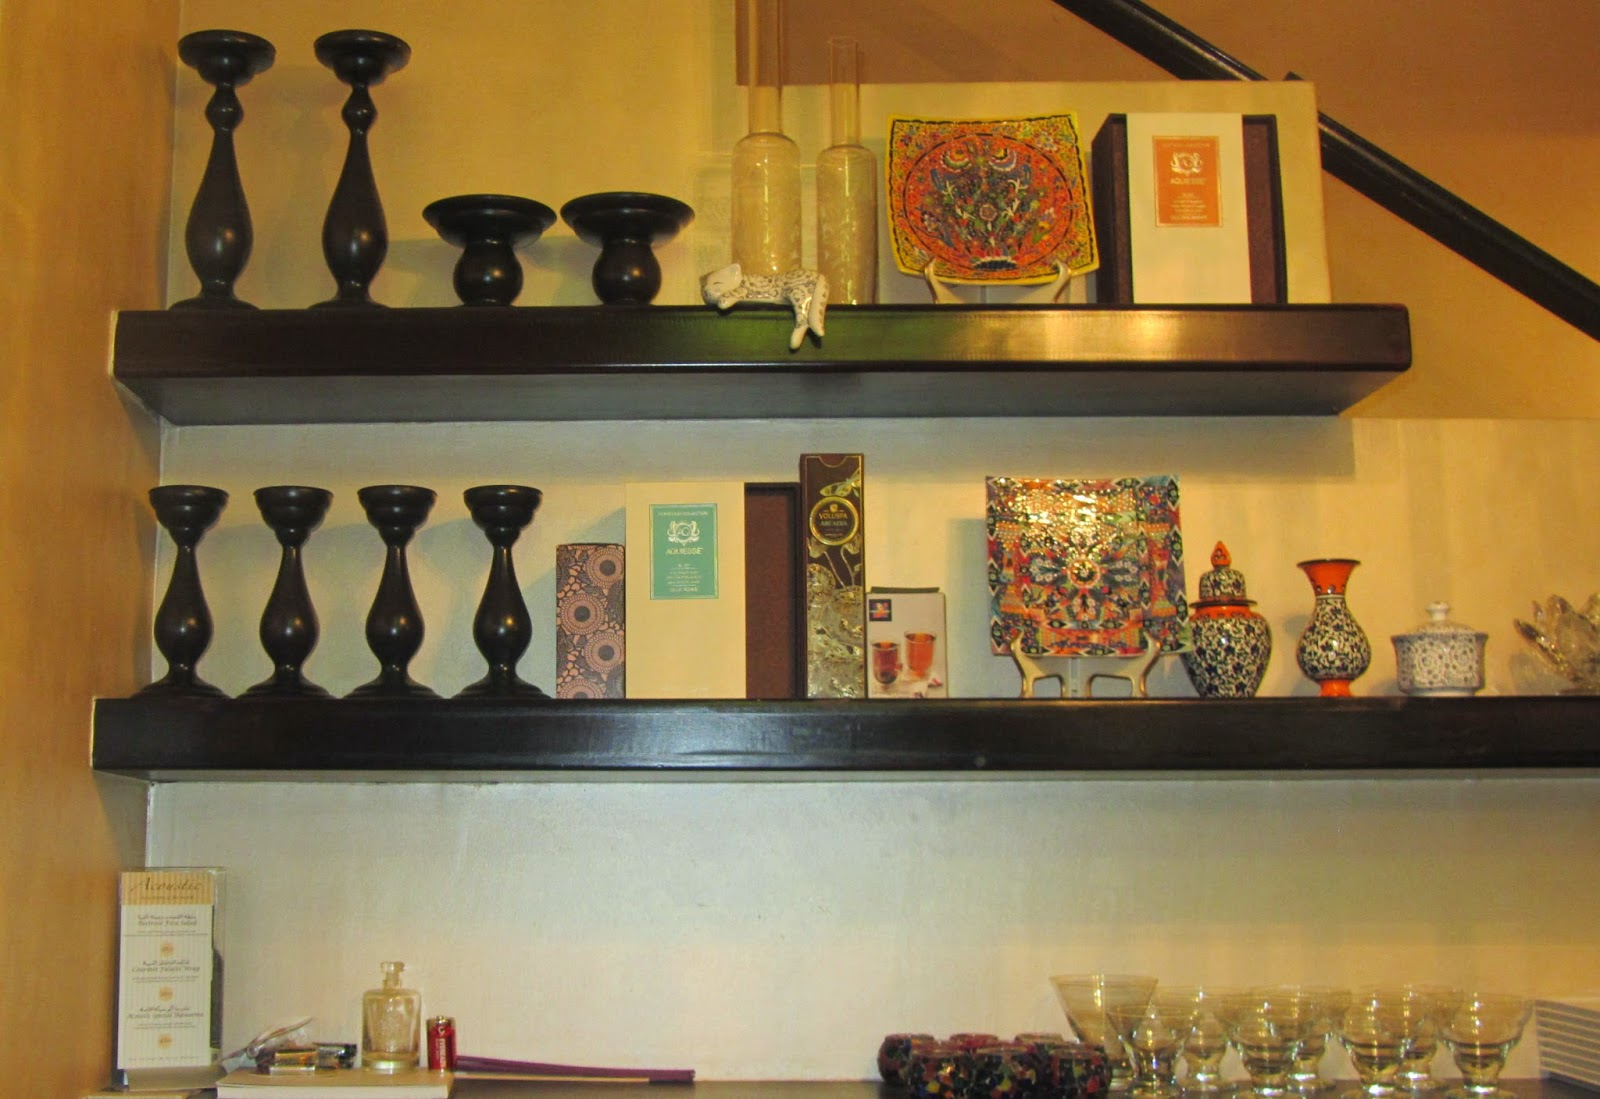 Acoustic Tea Lounge and Art Gallery Khobar Saudi Arabia blogging